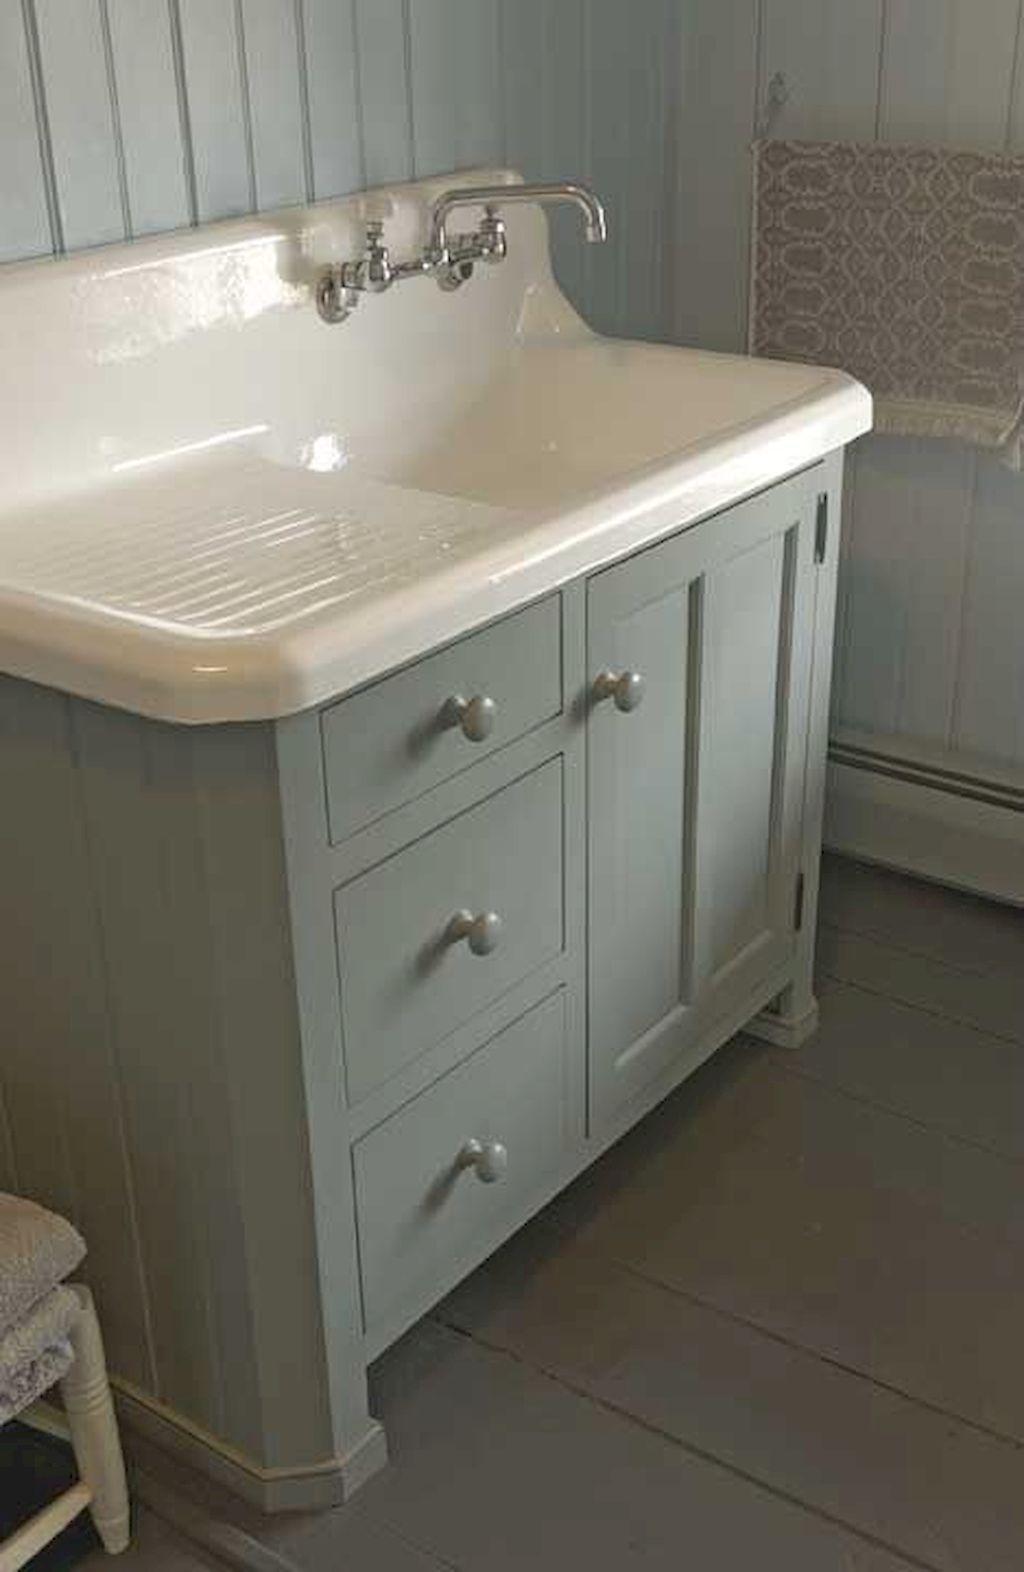 Gorgeous 125 Best Farmhouse Bathroom Vanity Remodel Ideas Https Roomadness Com 2018 Bathroom Vanity Remodel Farmhouse Bathroom Vanity Farmhouse Sink Kitchen